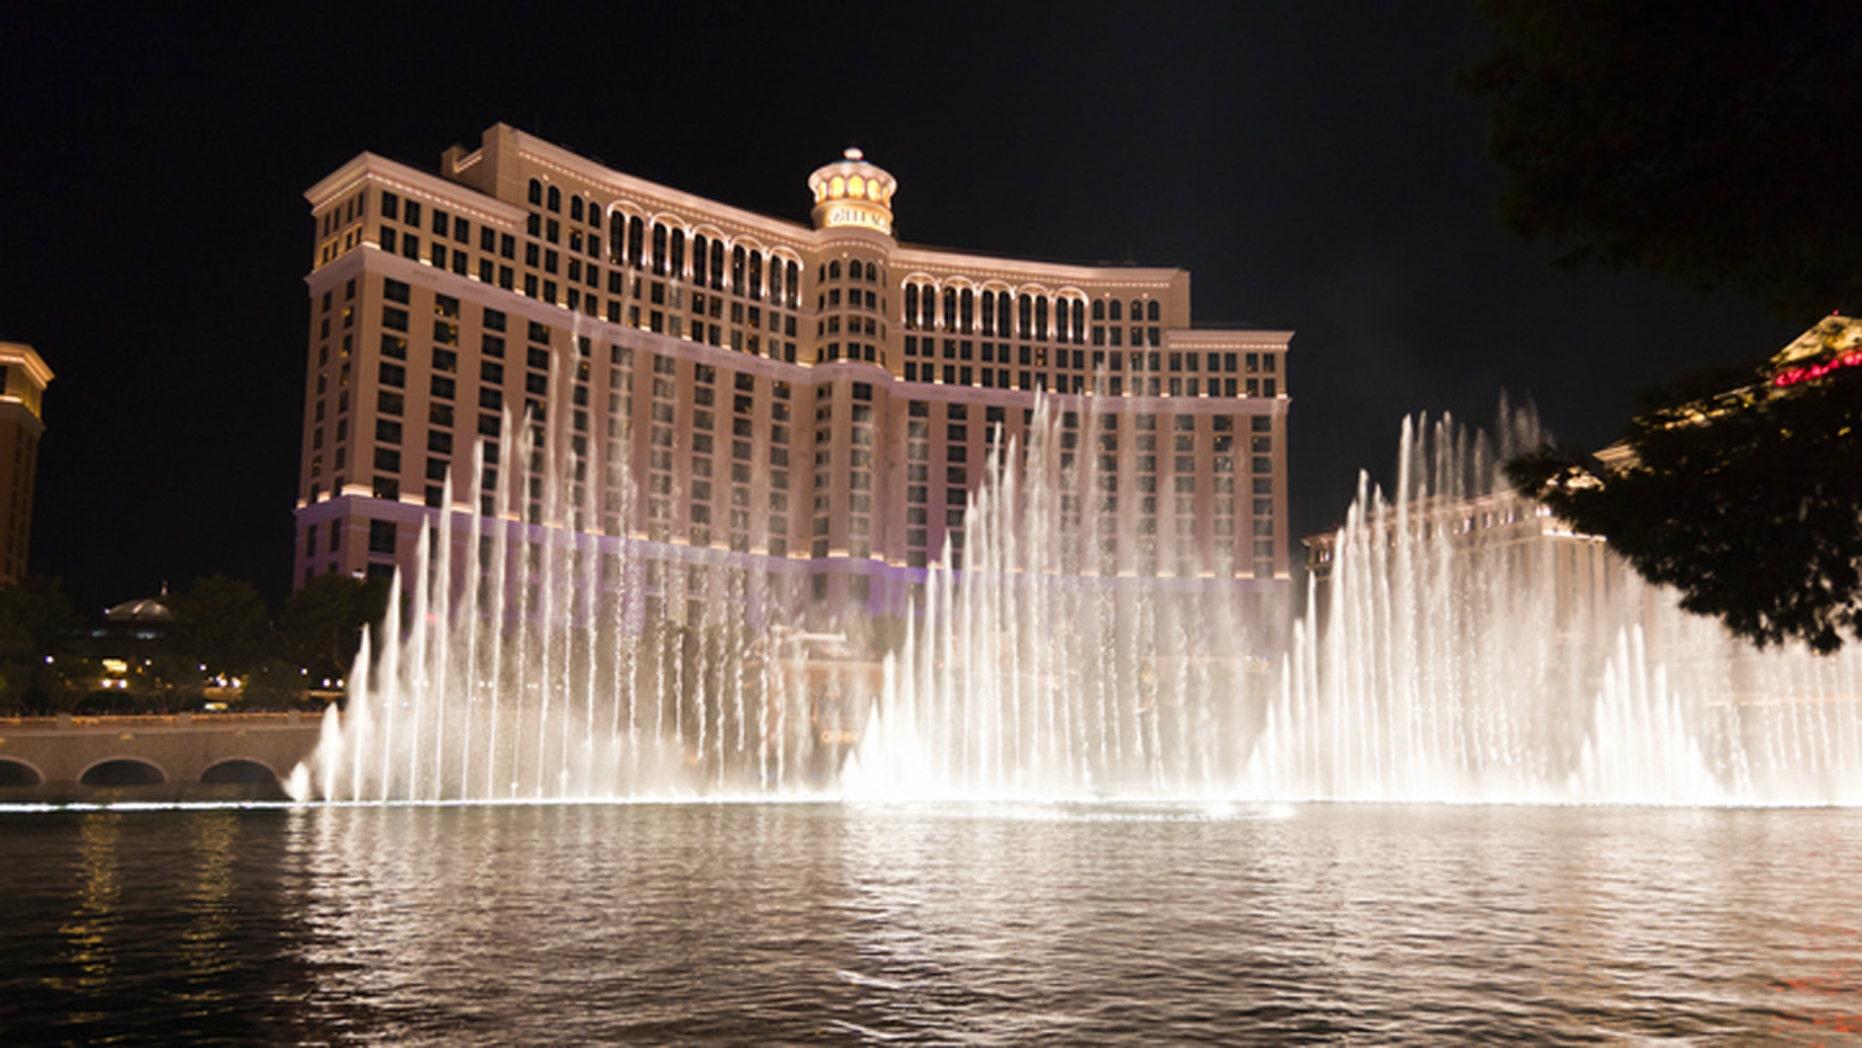 Las Vegas, Nevada (USA) - August 29, 2011: The fountain show at the Bellagio Hotel in Las Vegas, Nevada